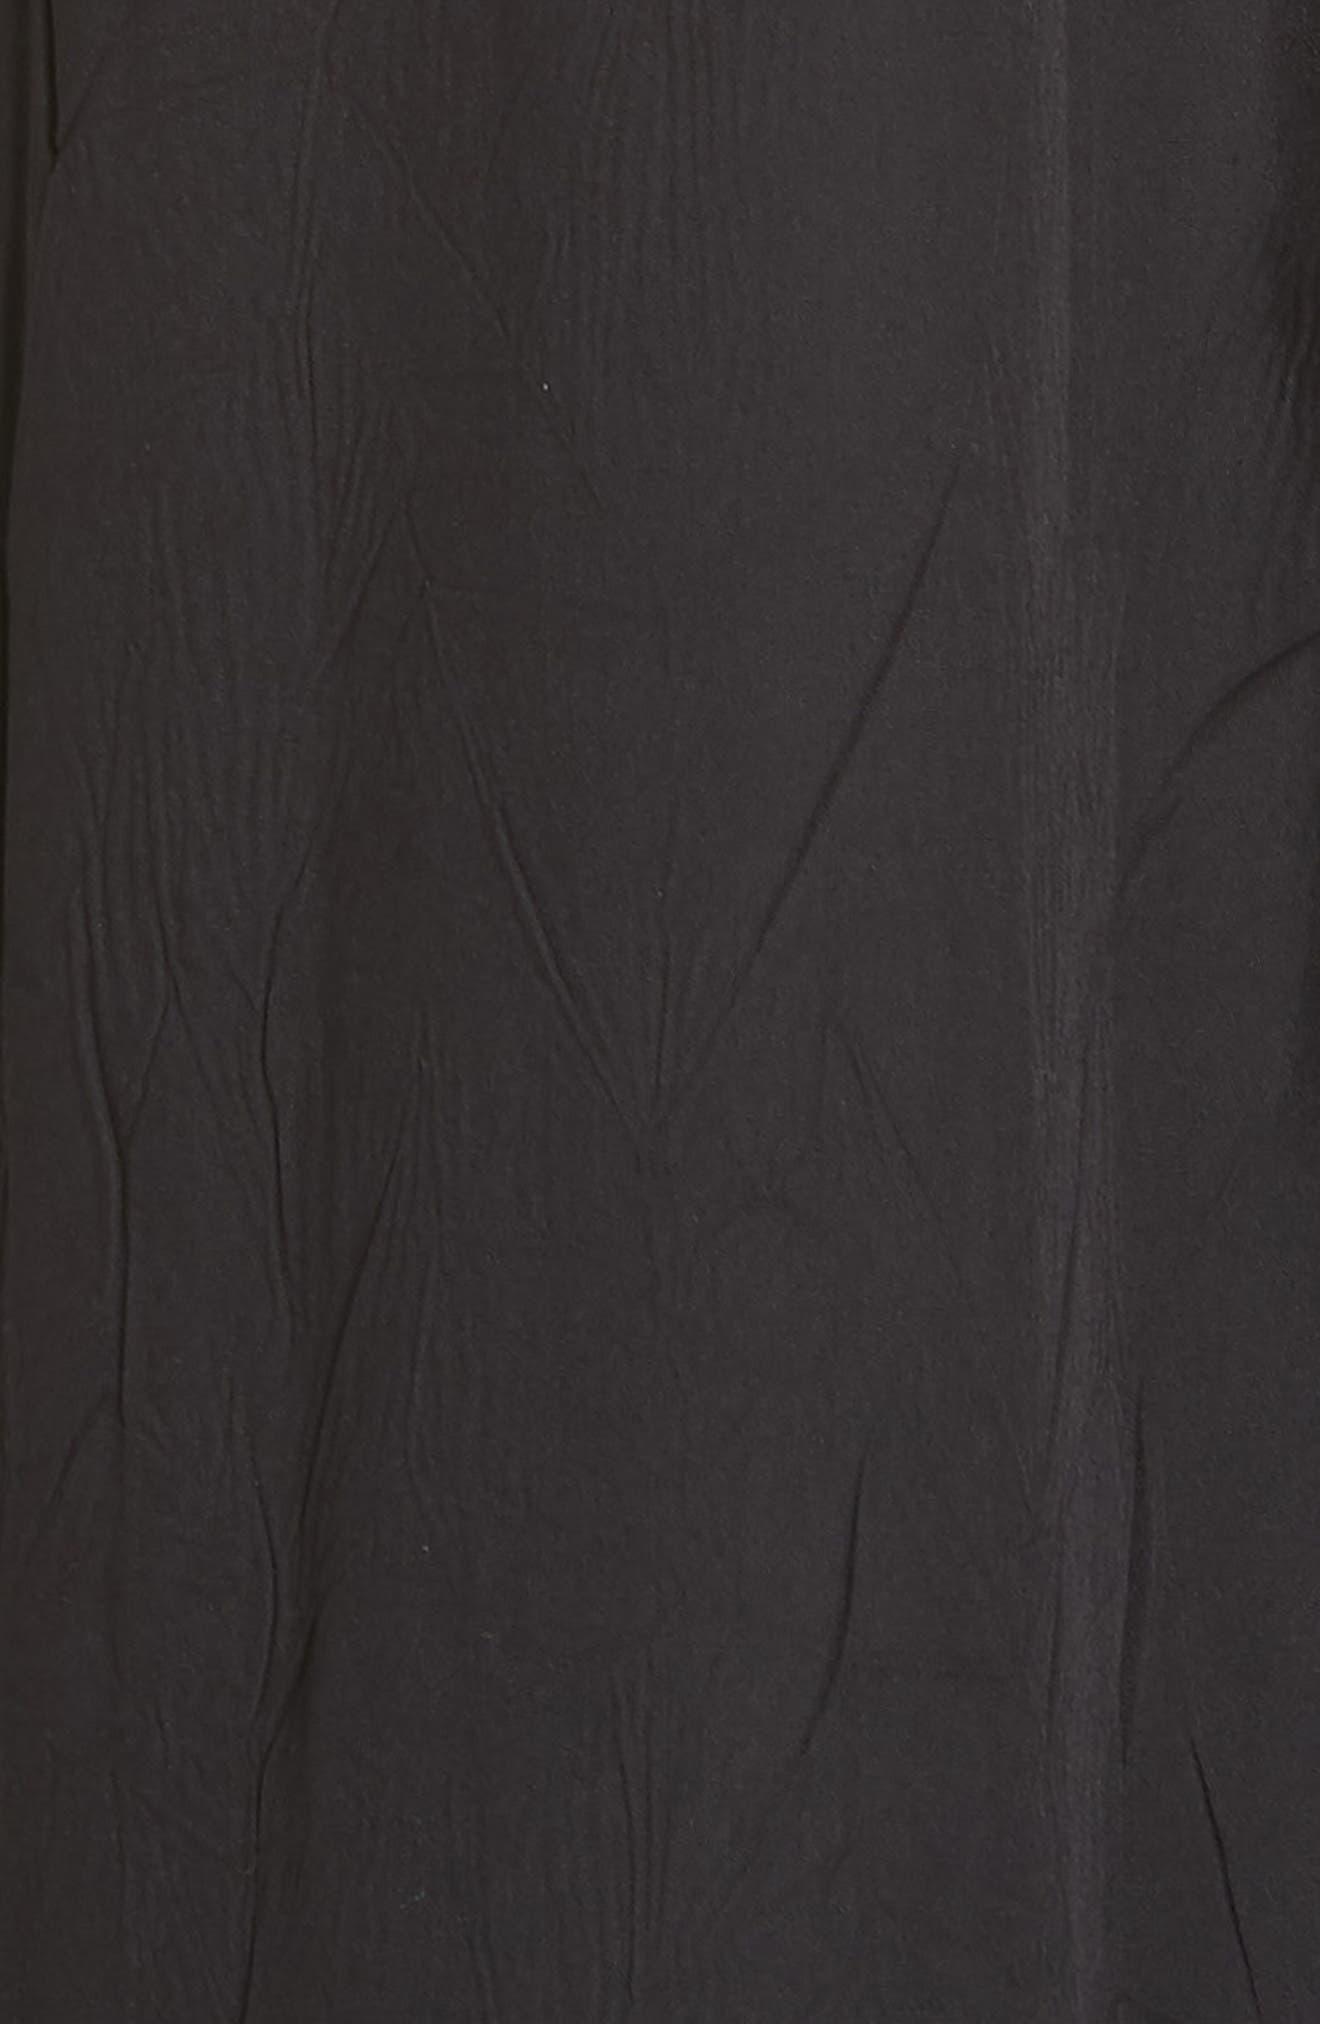 Tiered Halter Keyhole Dress,                             Alternate thumbnail 5, color,                             Black